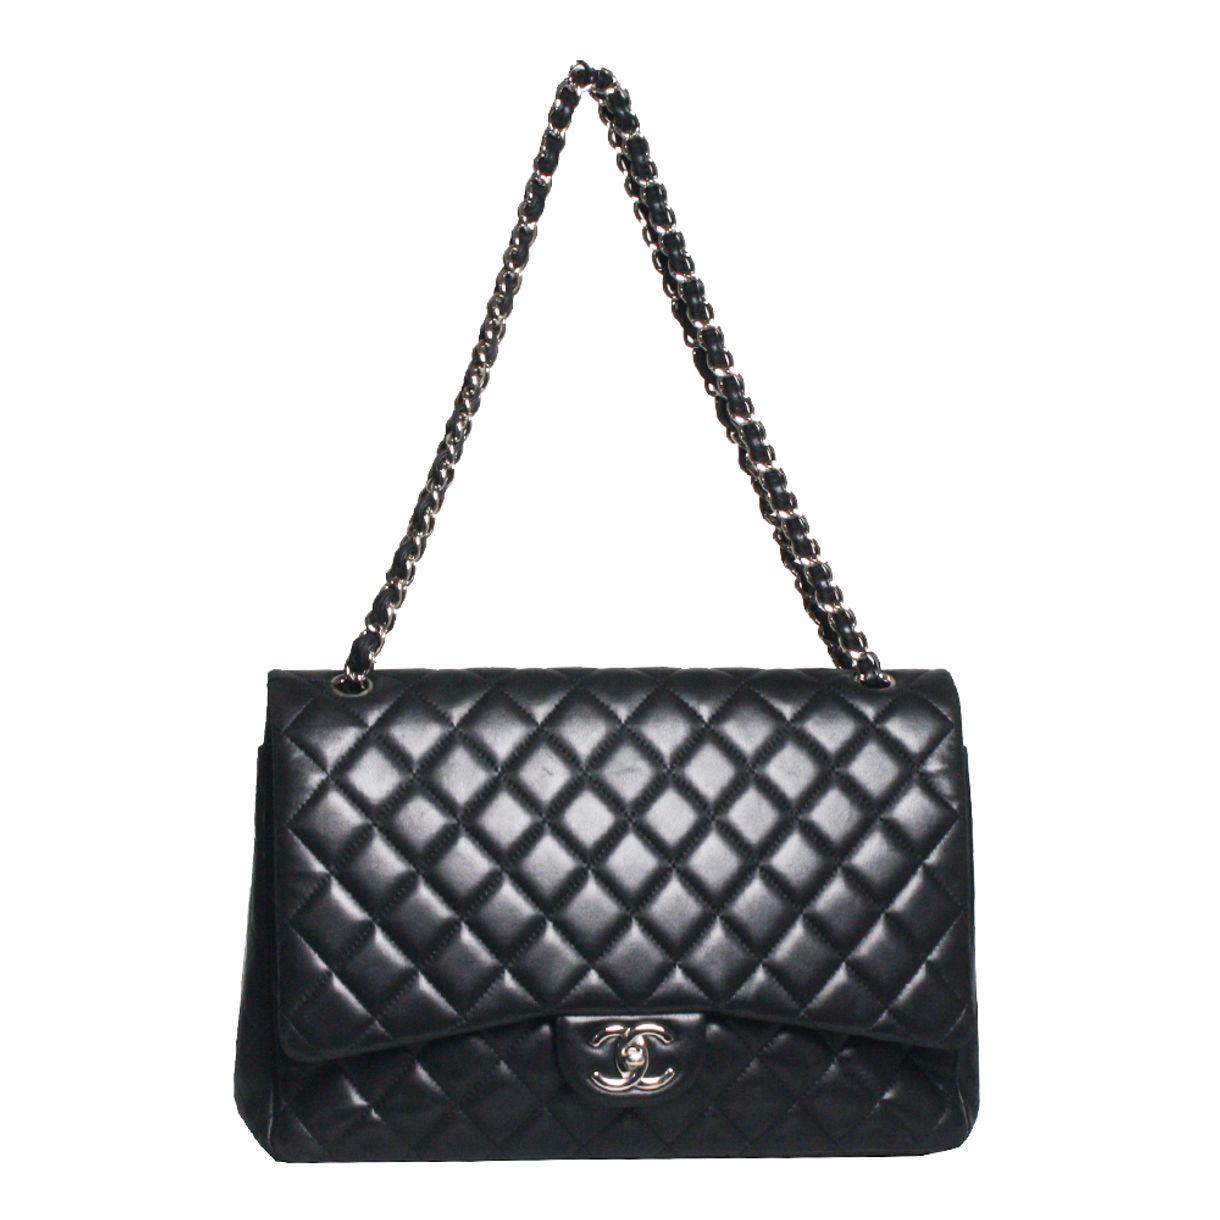 Bolsa-Chanel-Double-Flap-Maxi-Black